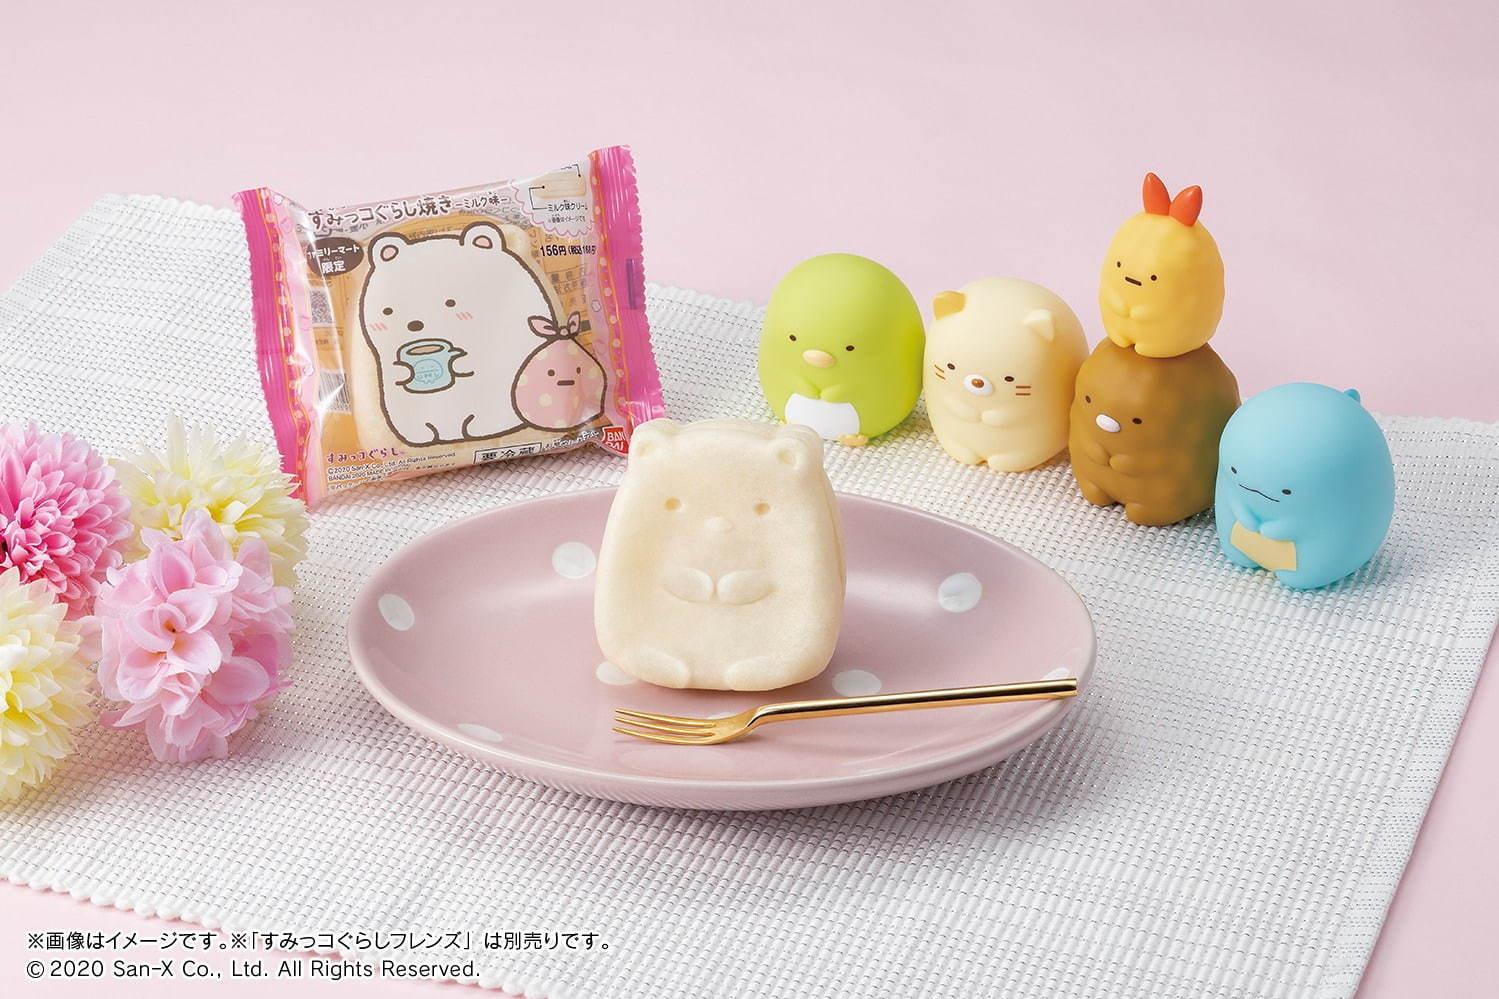 sumikko-gurasi-conbini-sweets